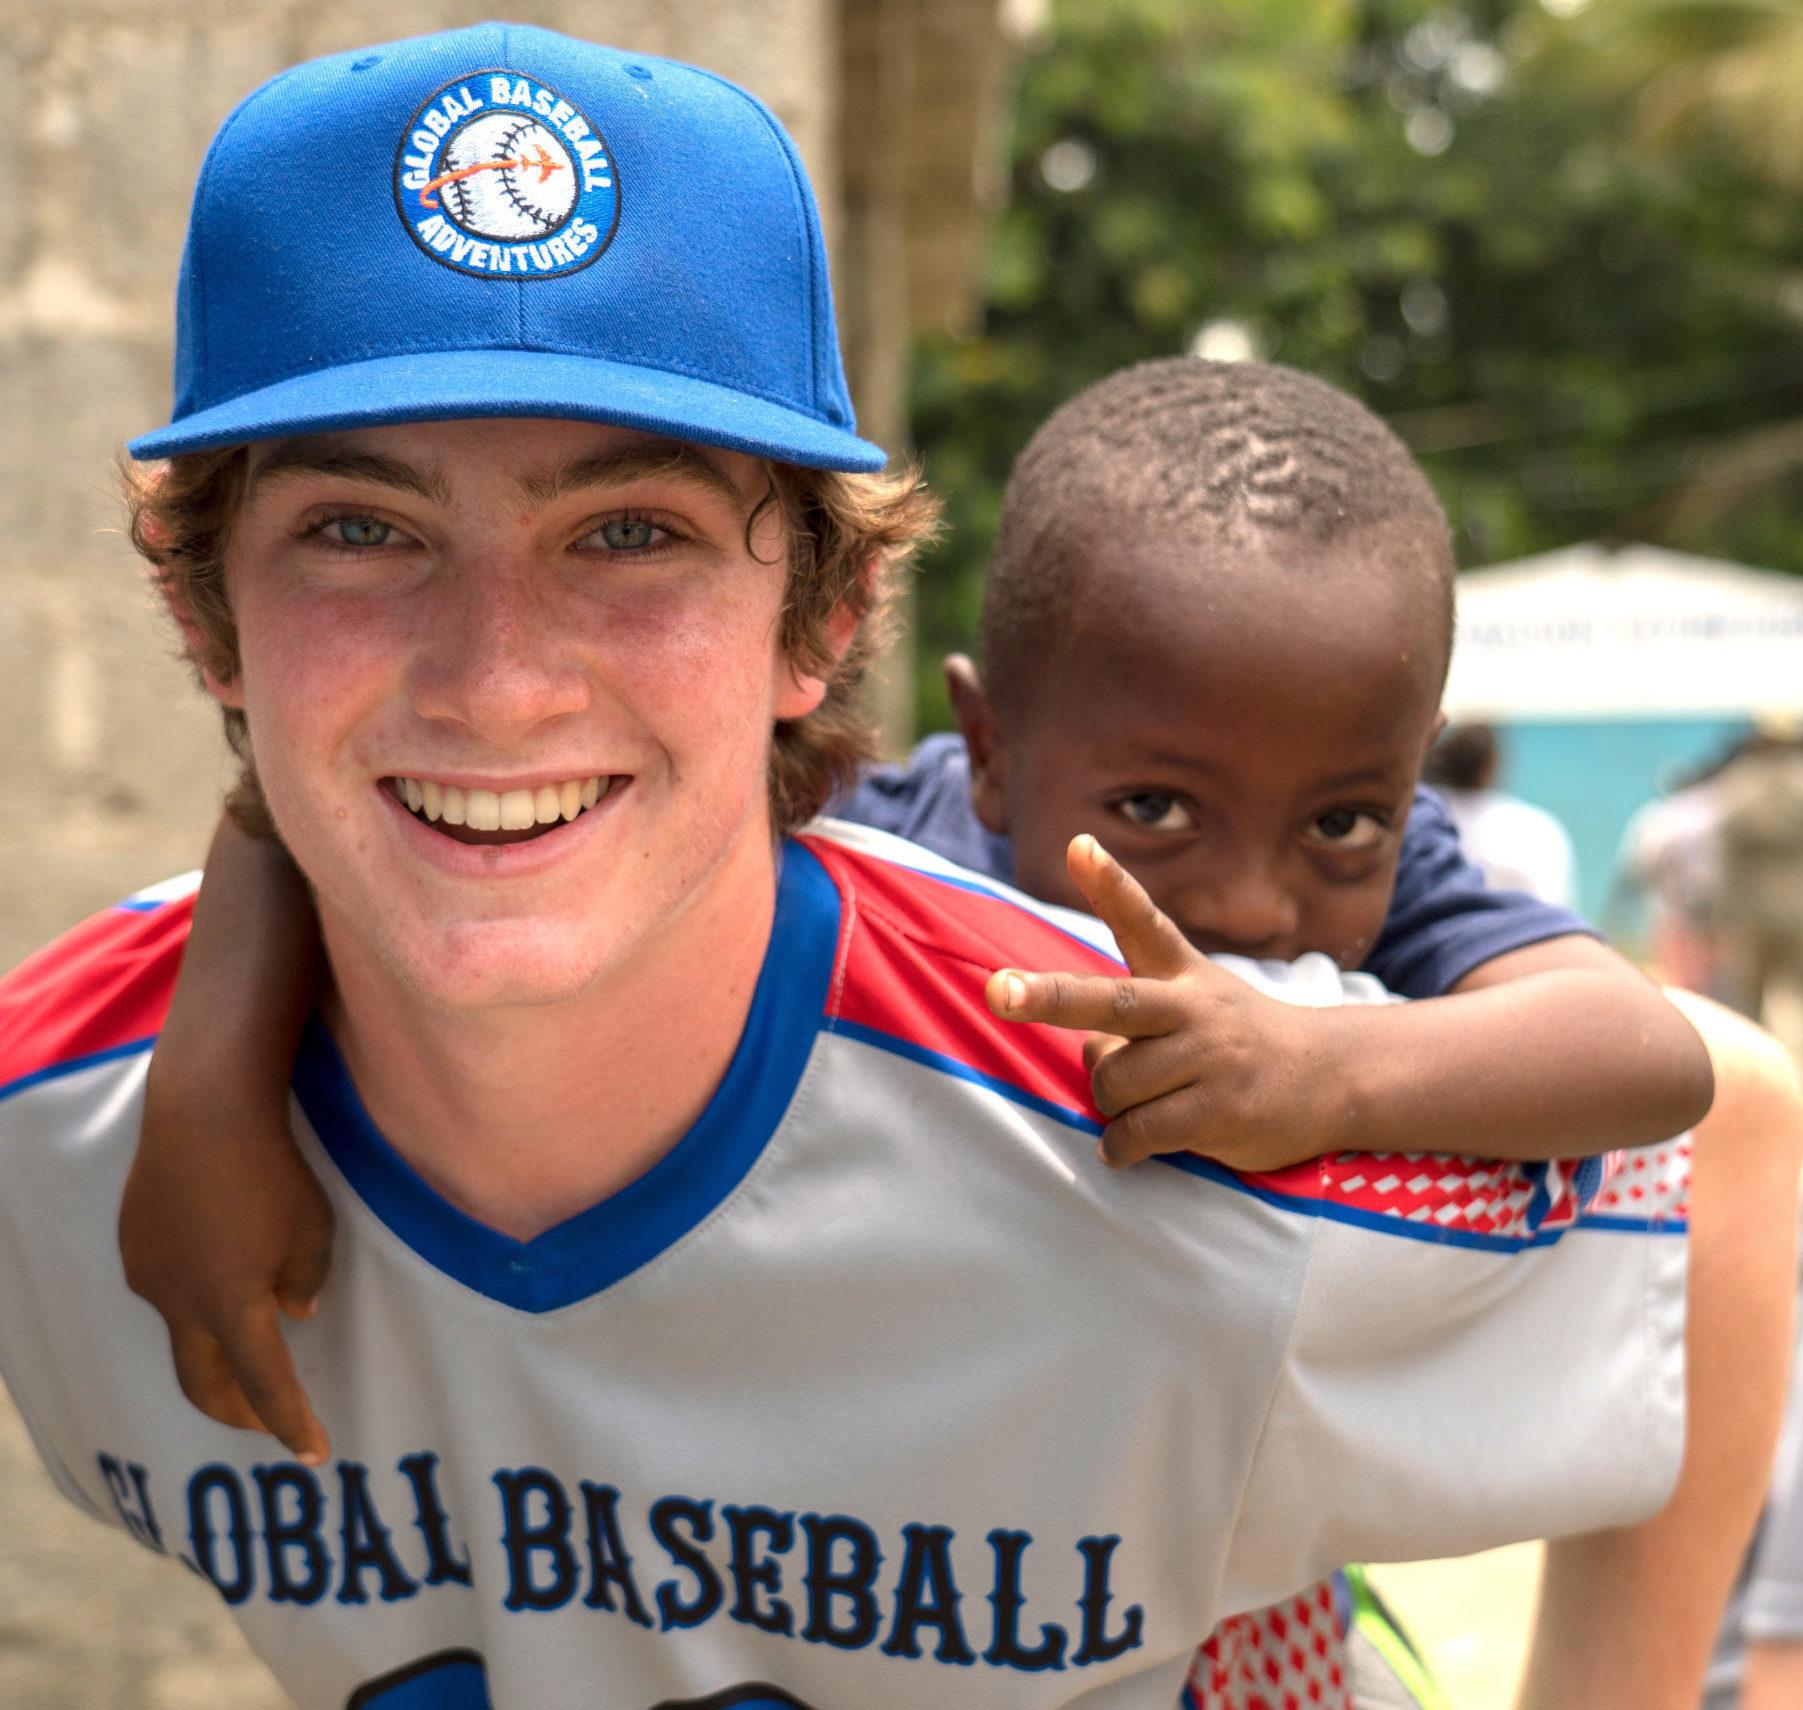 Dominican Republic charity baseball